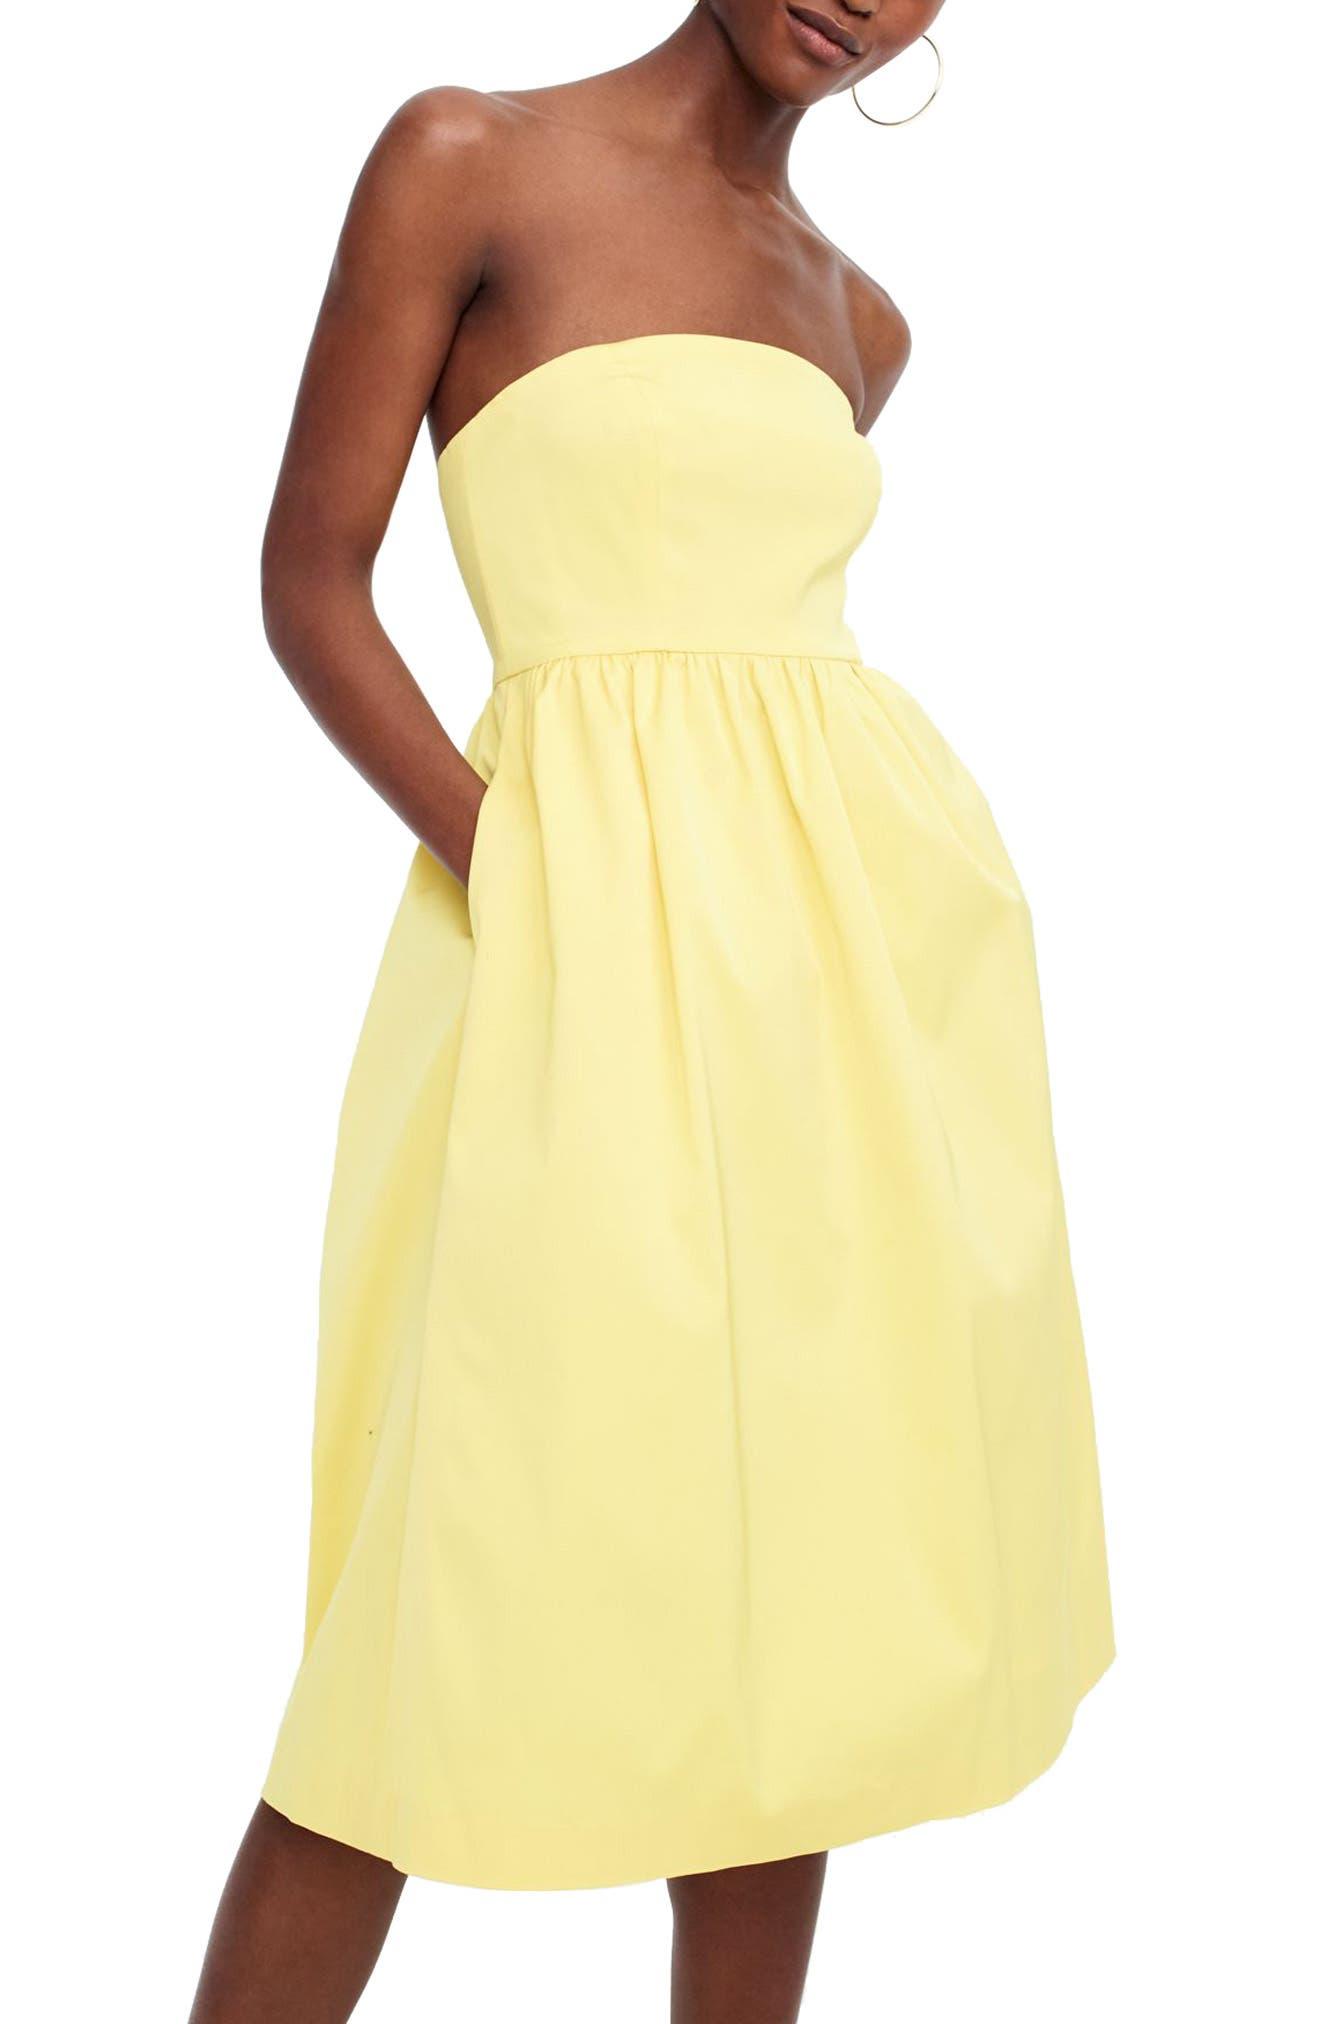 J.Crew Strapless Fit & Flare Dress,                         Main,                         color, Bright Lemon